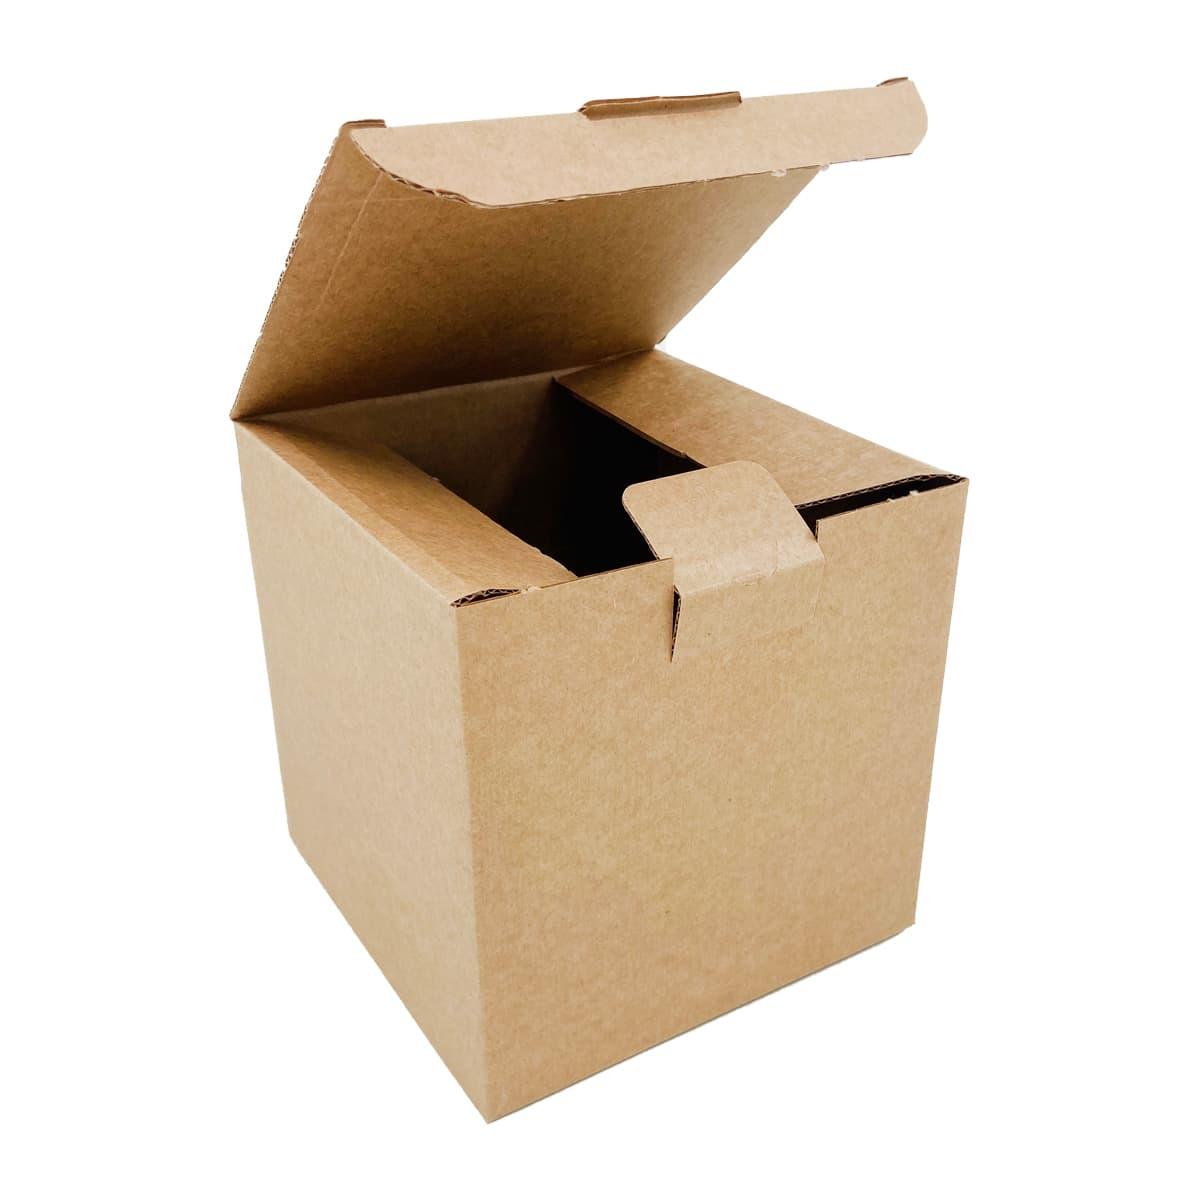 Kilitli Kutu Çeşitleri